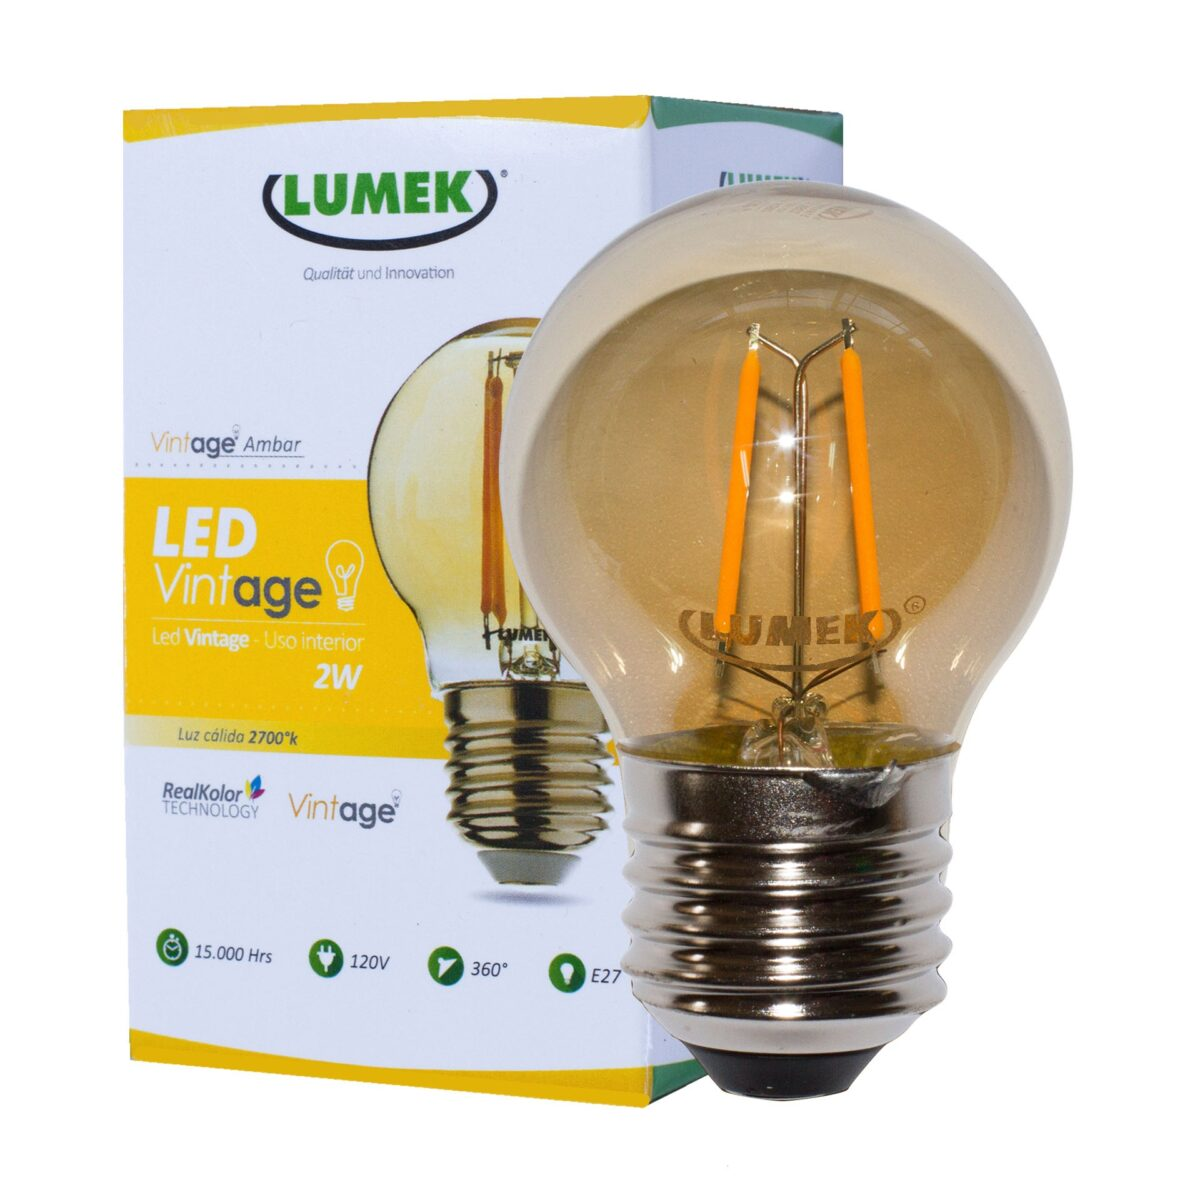 LED ECO VINTAGE AMBAR 2W 2700K 120V E27 LUMEK_2